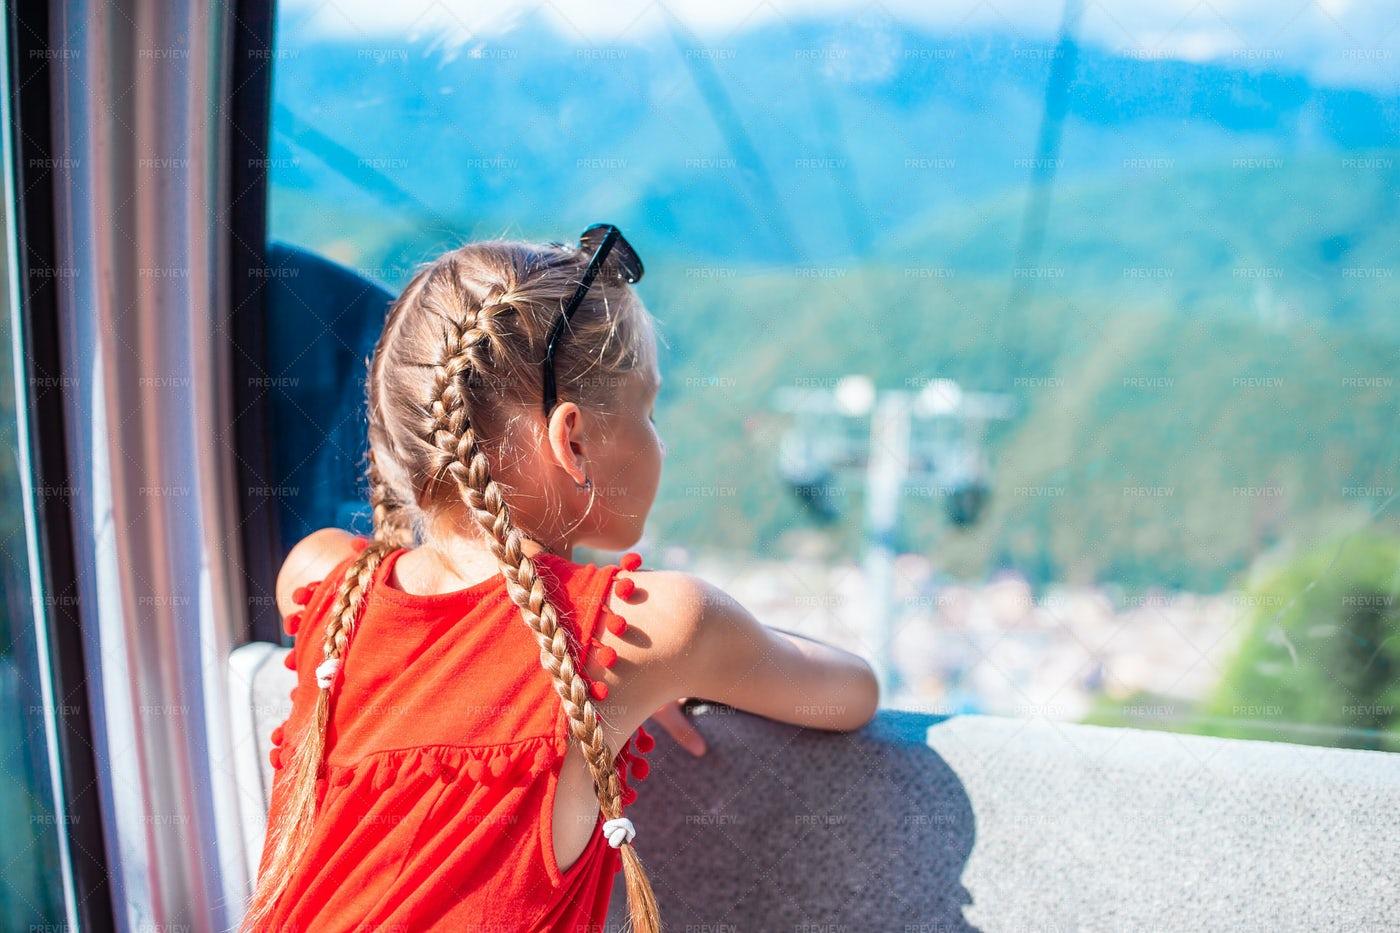 Little Girl On A Cable Car: Stock Photos